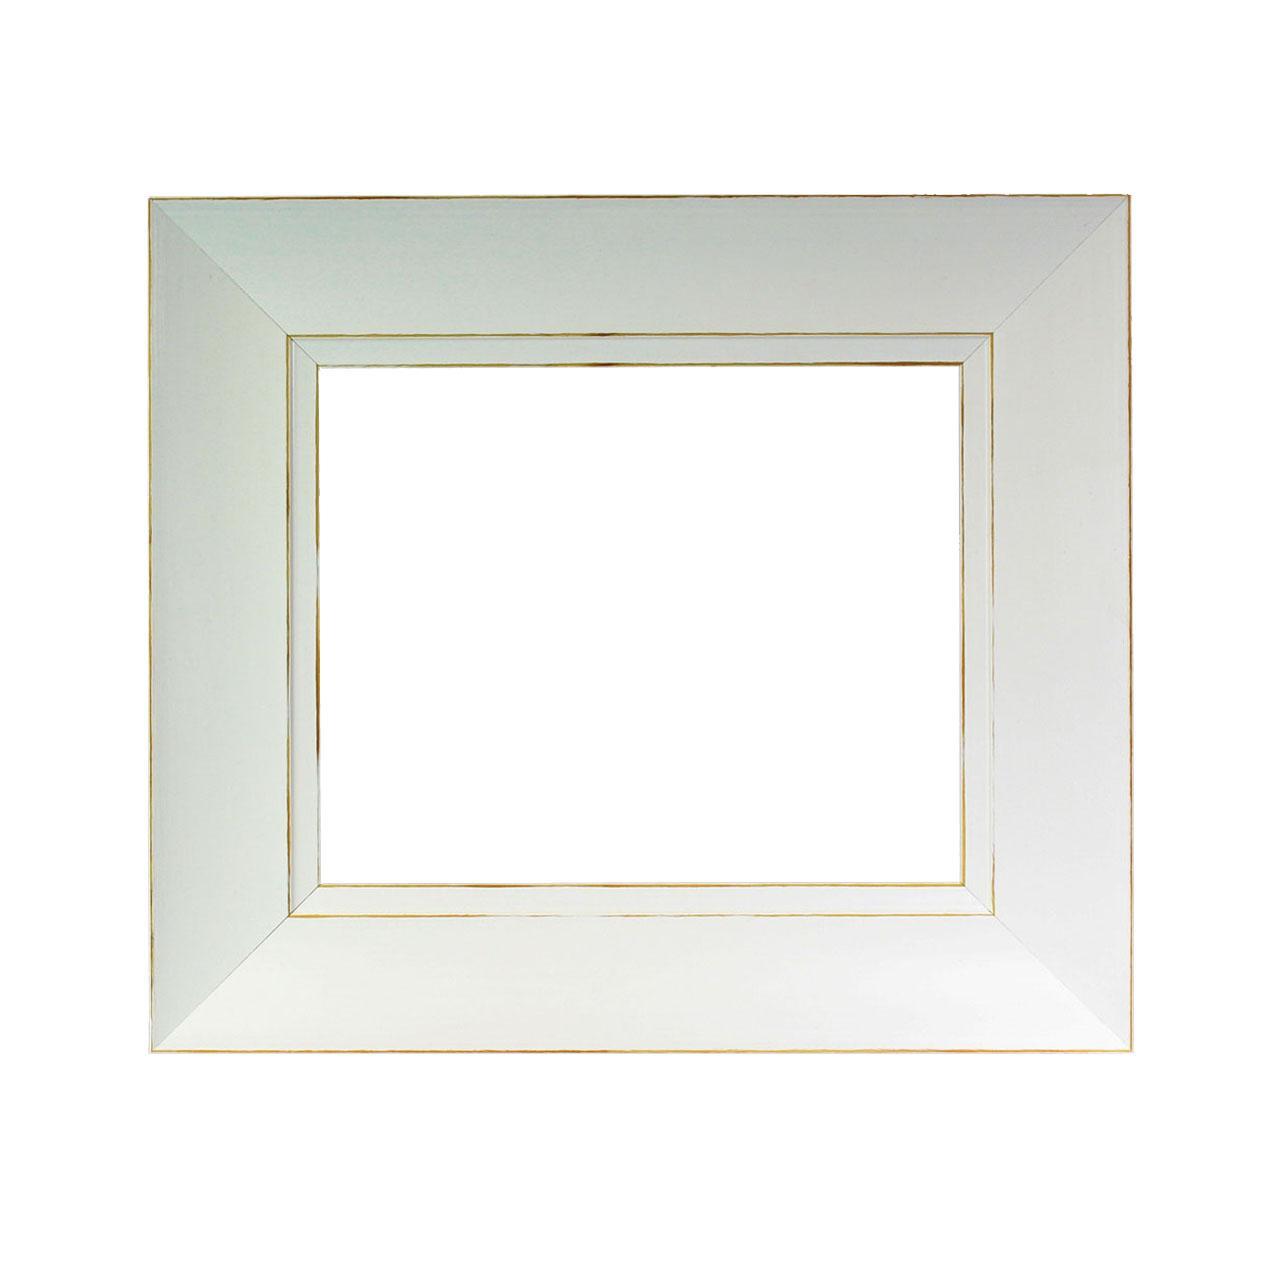 galva blanc cadre pour tableau cadres en stock. Black Bedroom Furniture Sets. Home Design Ideas